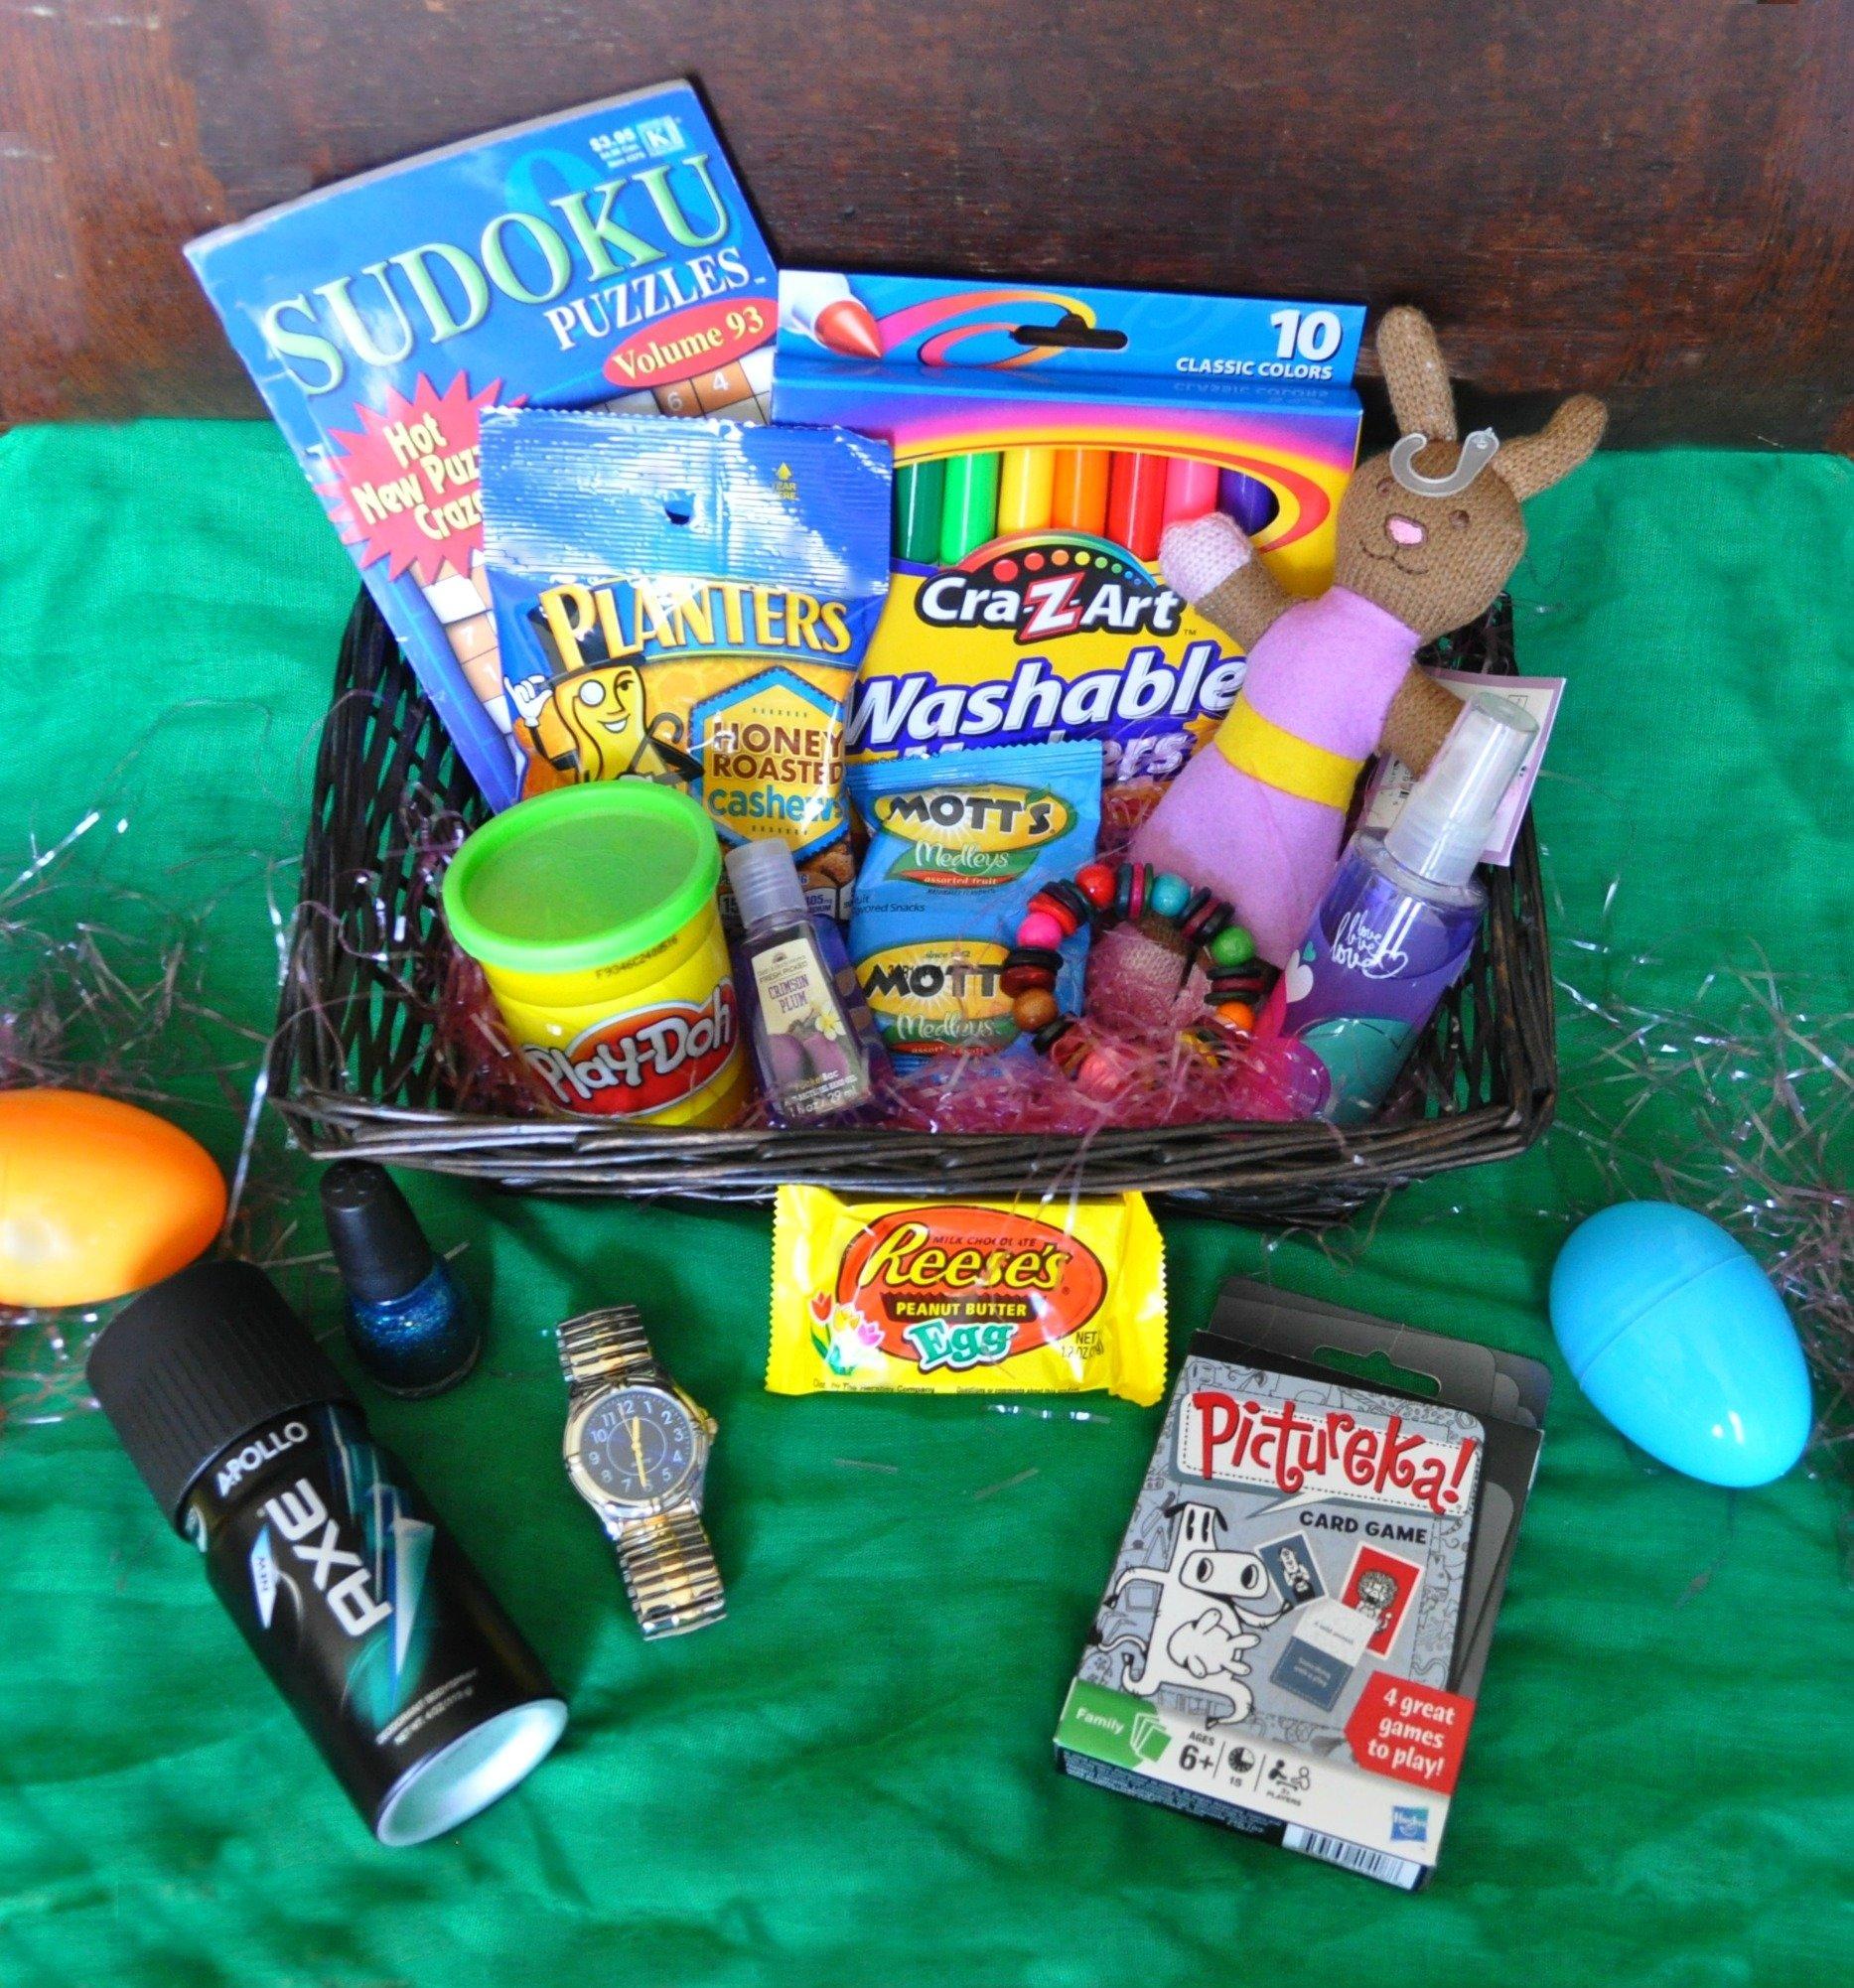 10 Most Popular Easter Basket Ideas For Teenagers 100 easter basket stuffer ideas mommysavers 2021